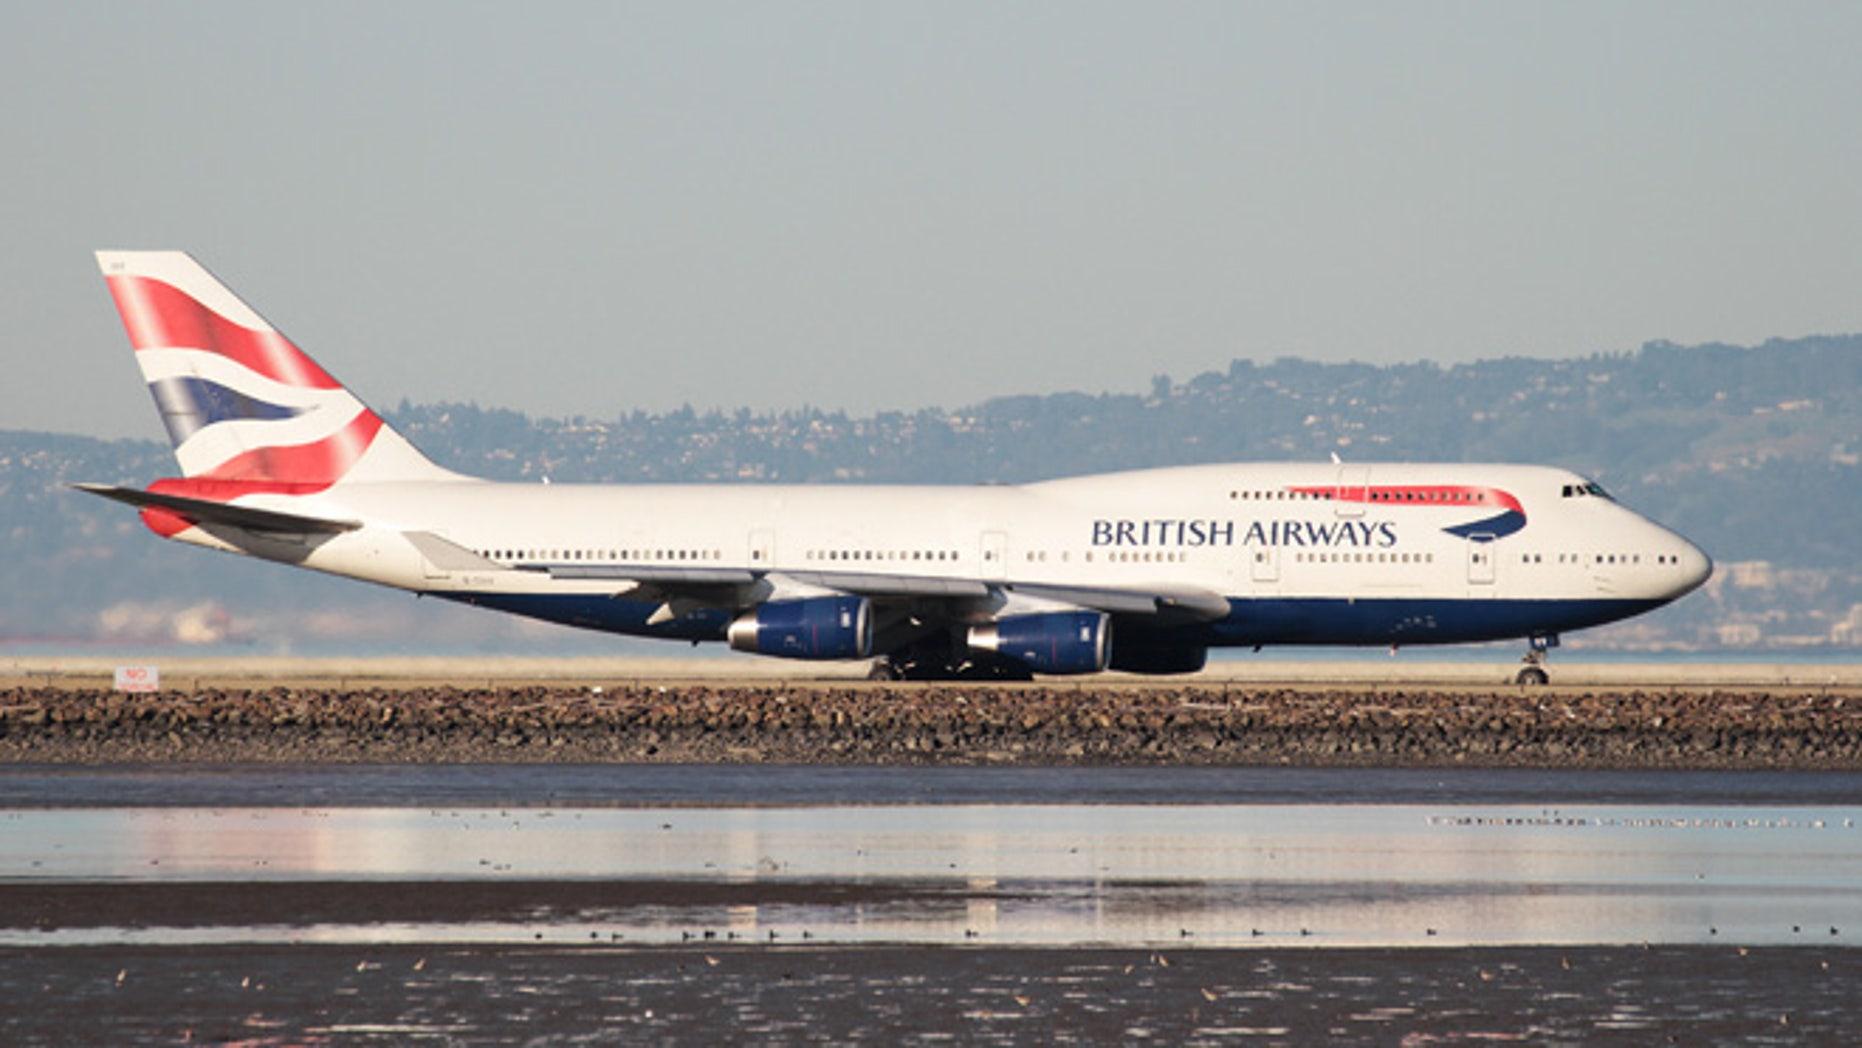 A British Airways Boeing 747-400 taxis at San Francisco International Airport